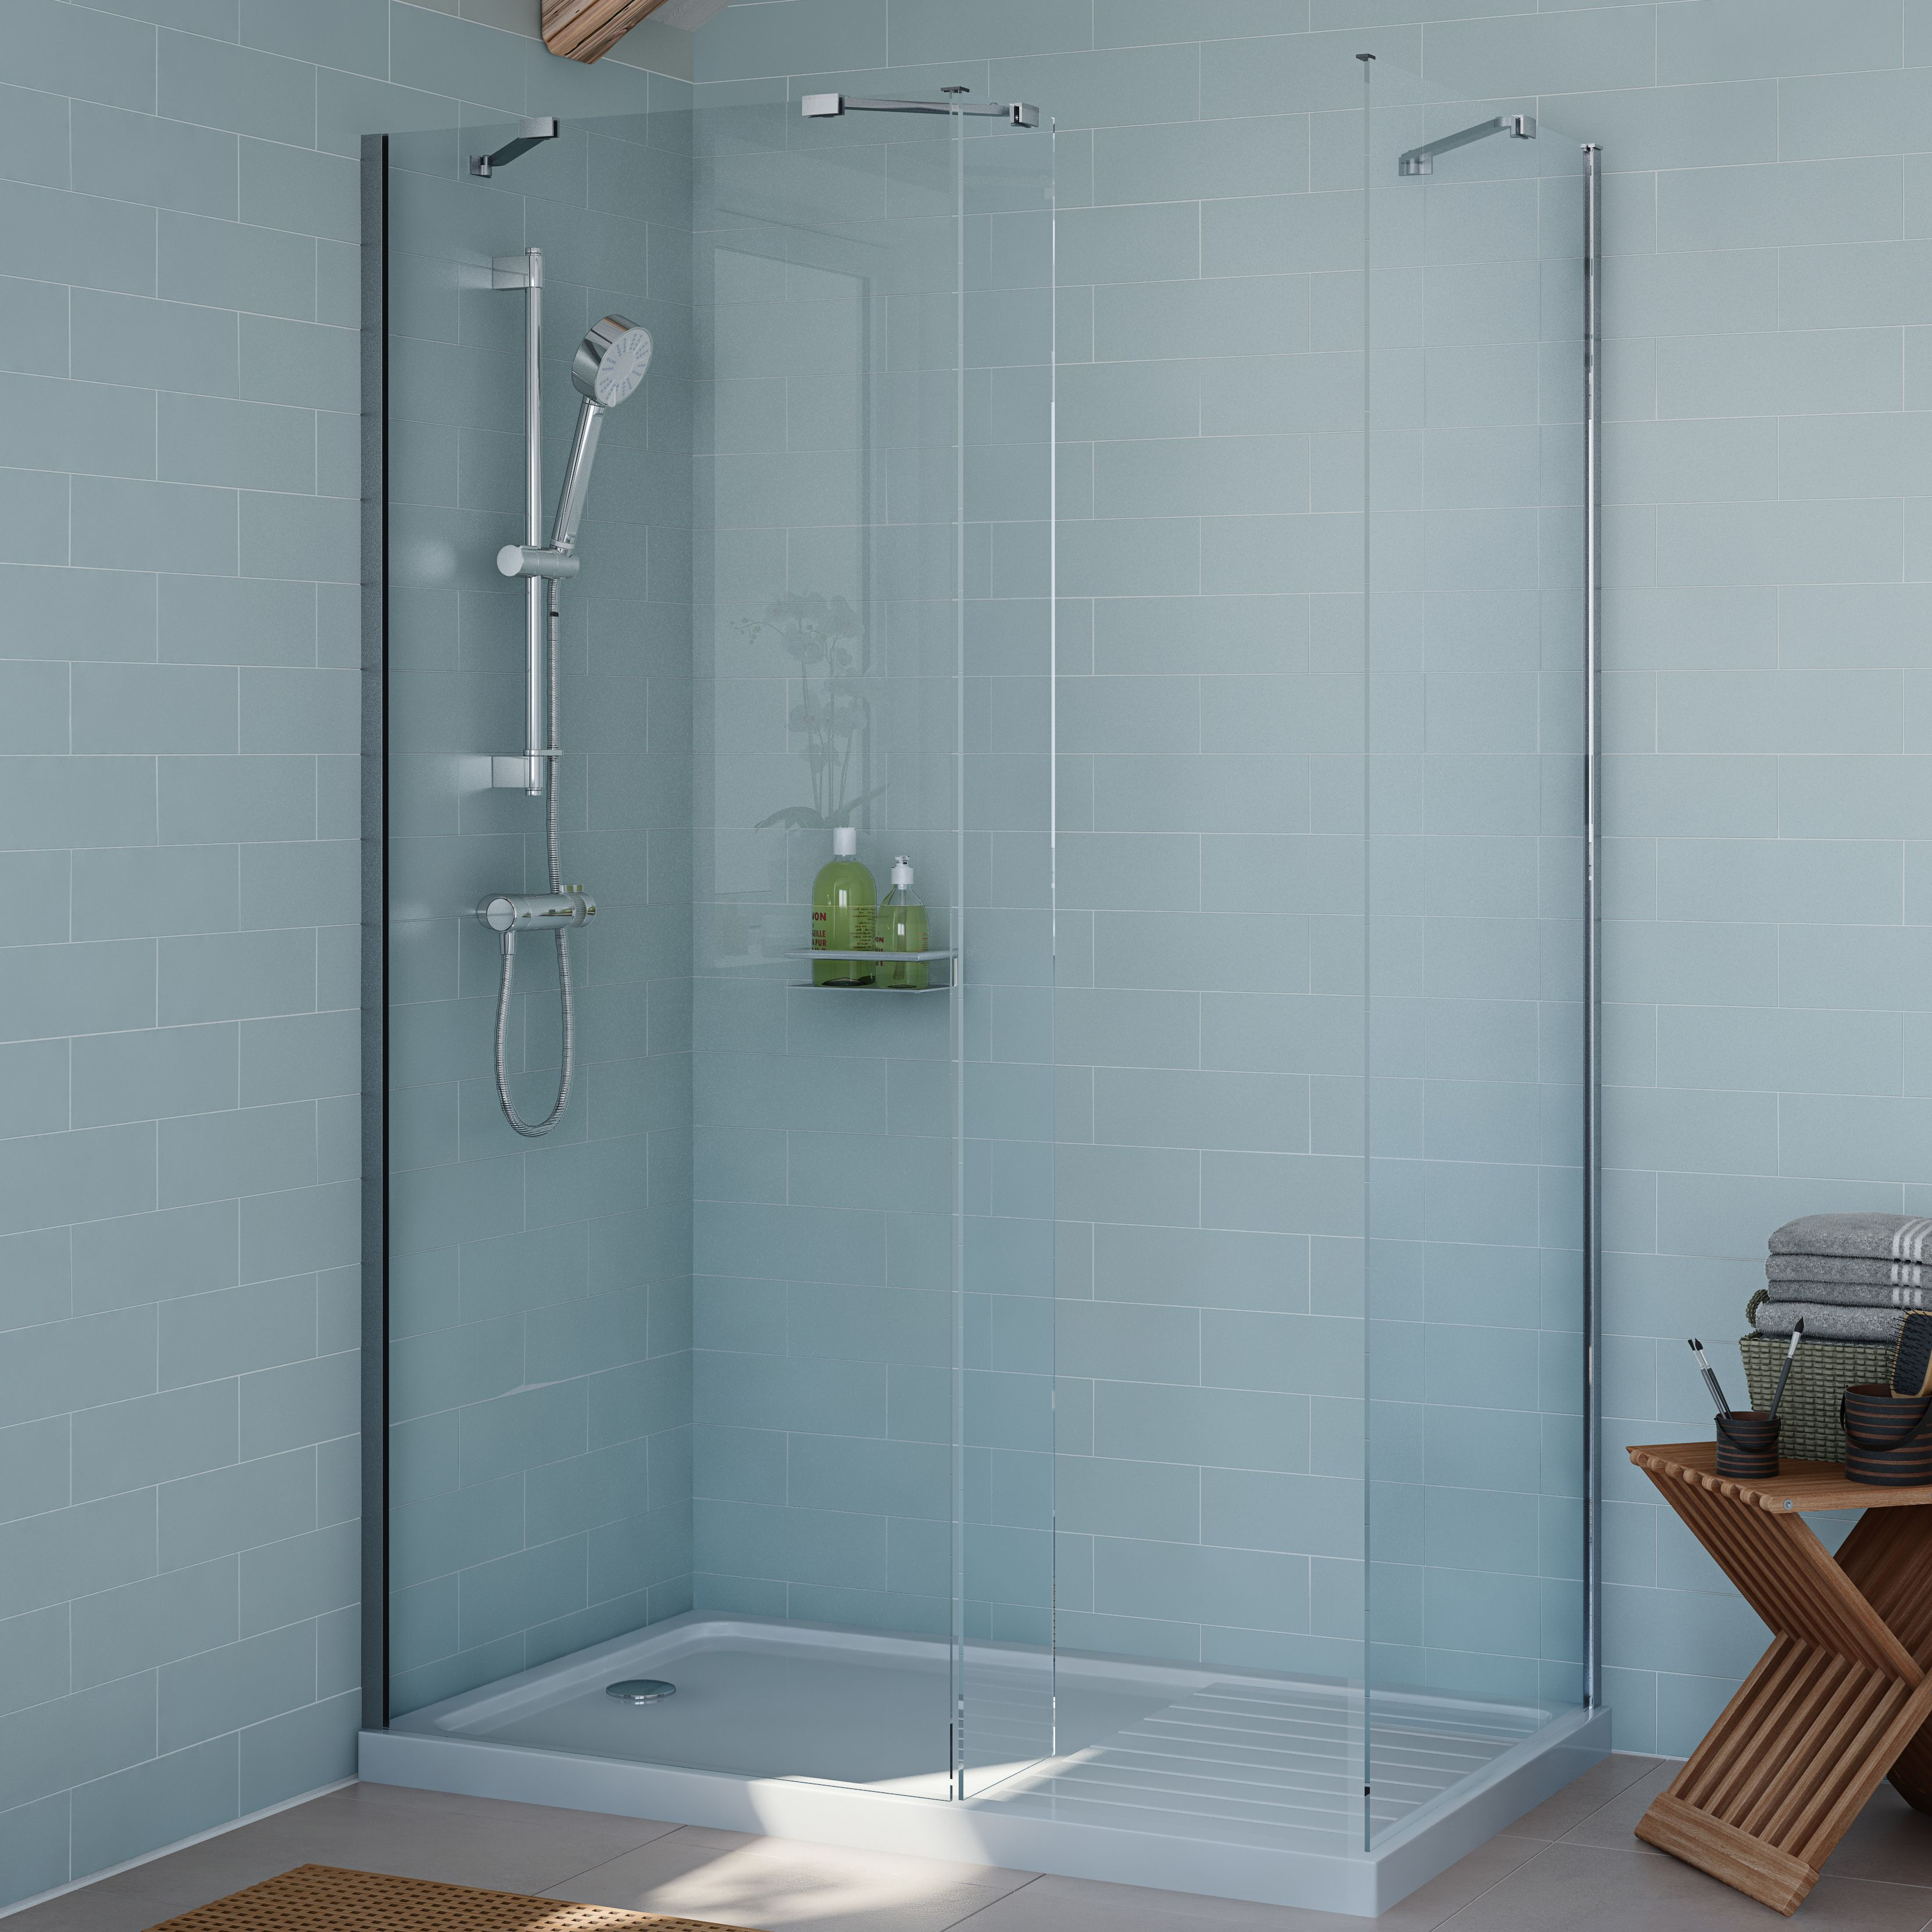 Cooke & Lewis Exuberance Rectangular Shower enclosure, tray & waste ...